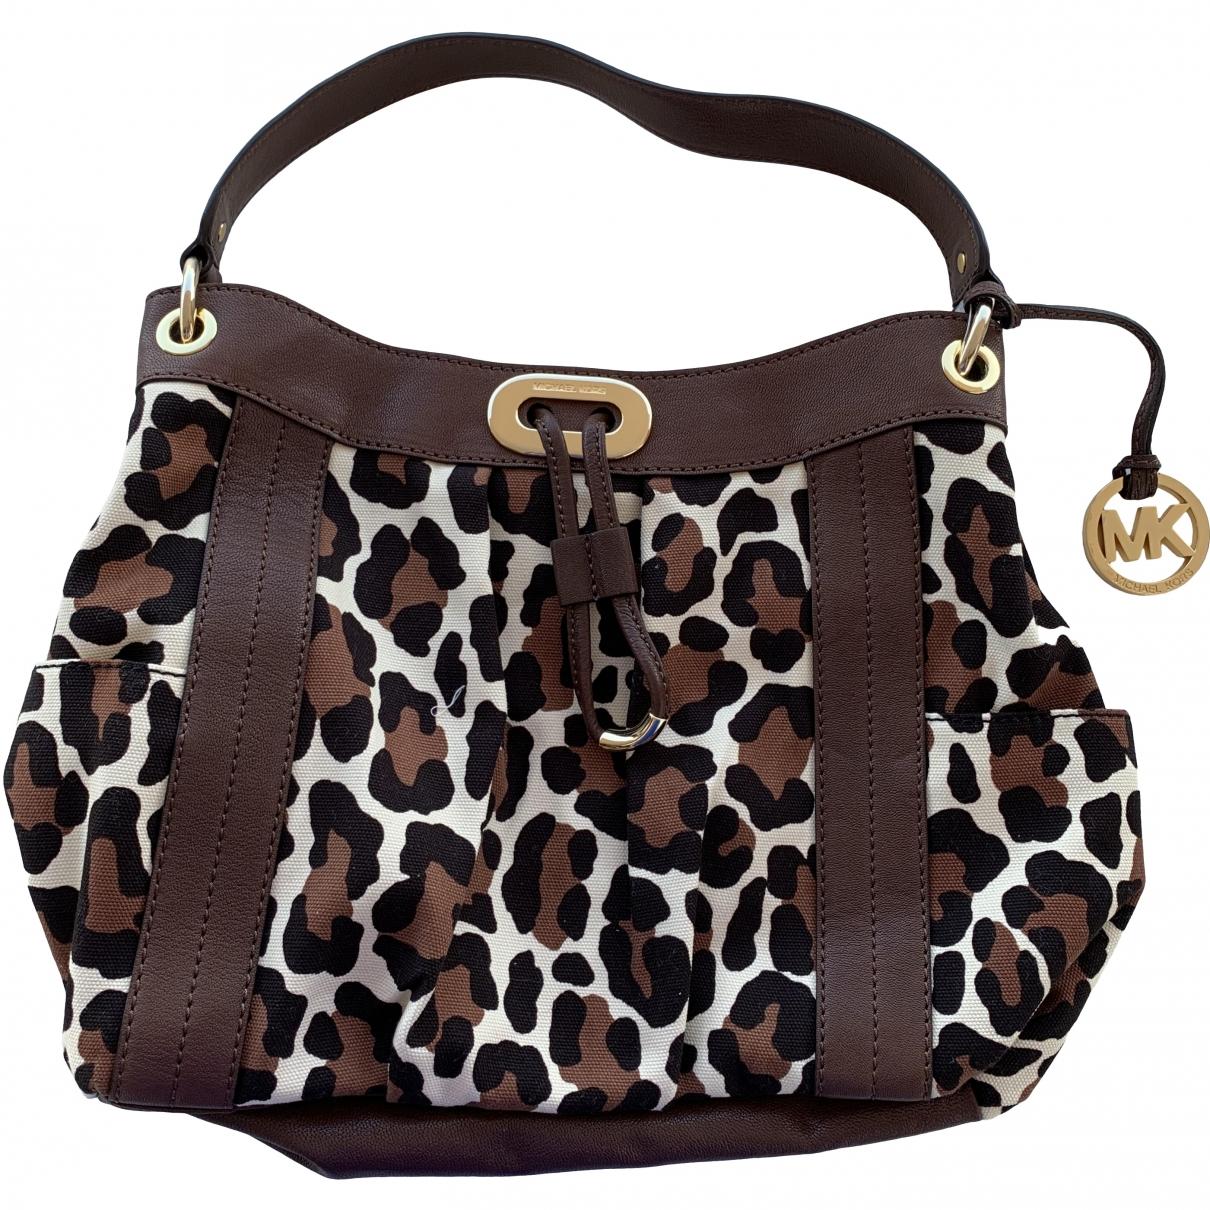 Michael Kors \N Brown Cloth handbag for Women \N